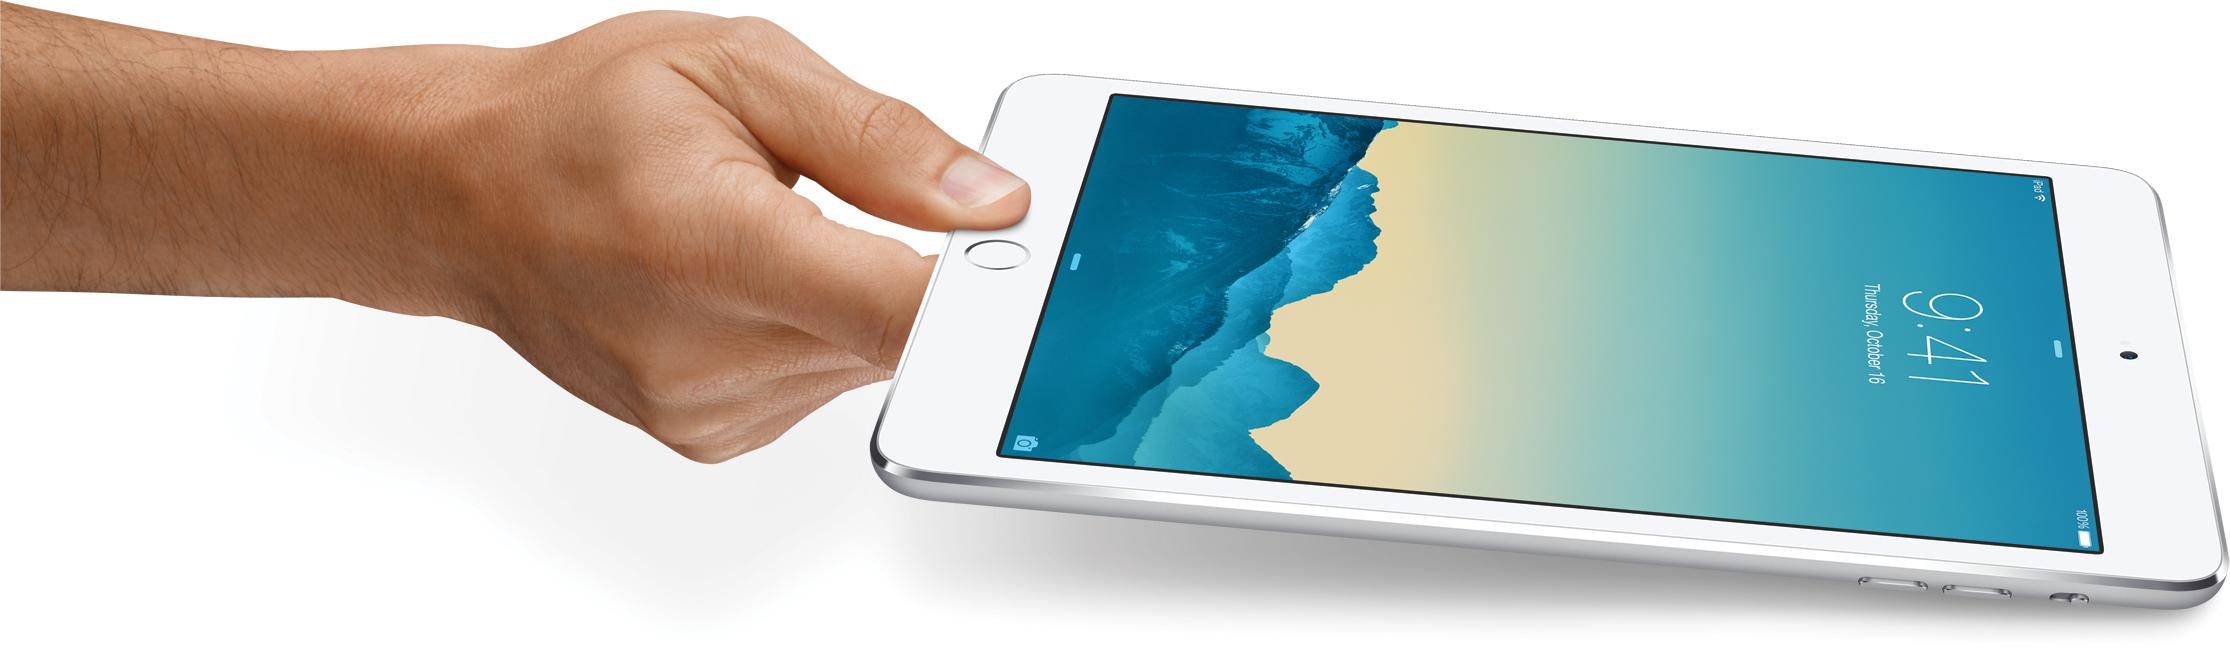 iPad mini 3 de lado, segurado por mão